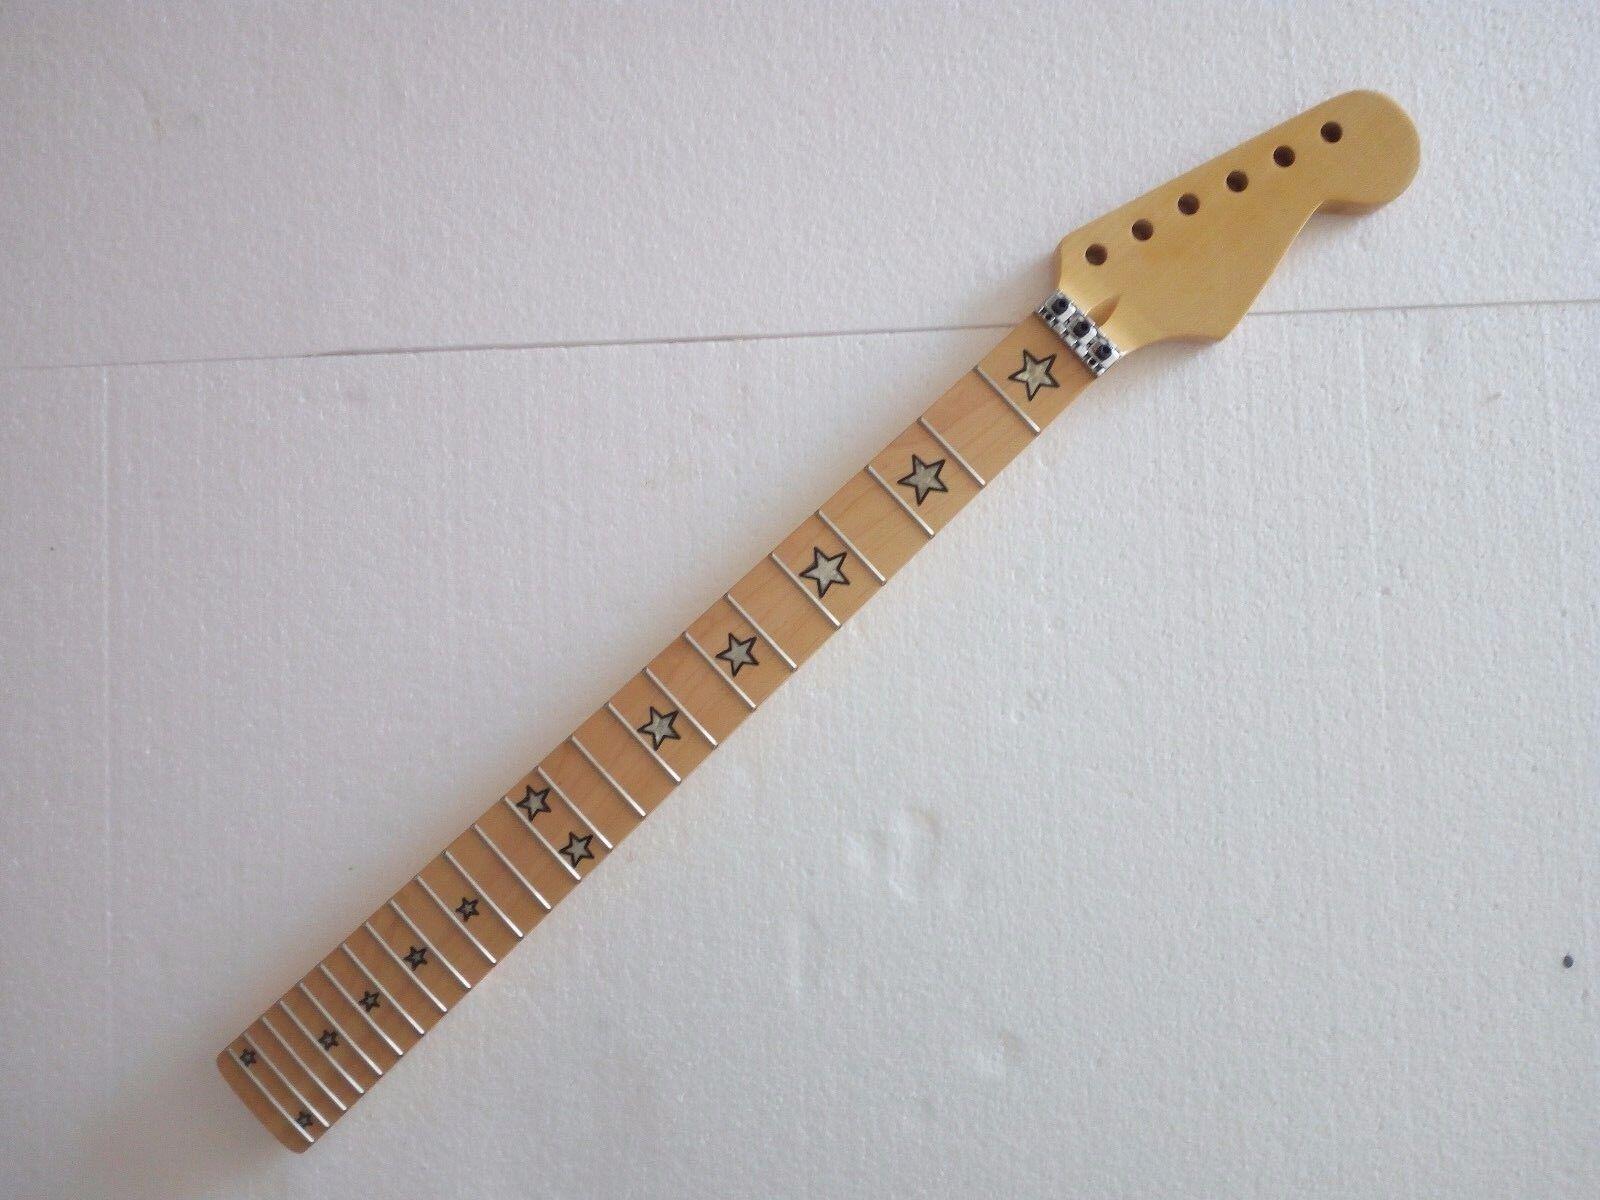 Best Maple E-Gitarre Hals Doppelrolle 24 Fret Ahorn Fretboard Inlay Teile